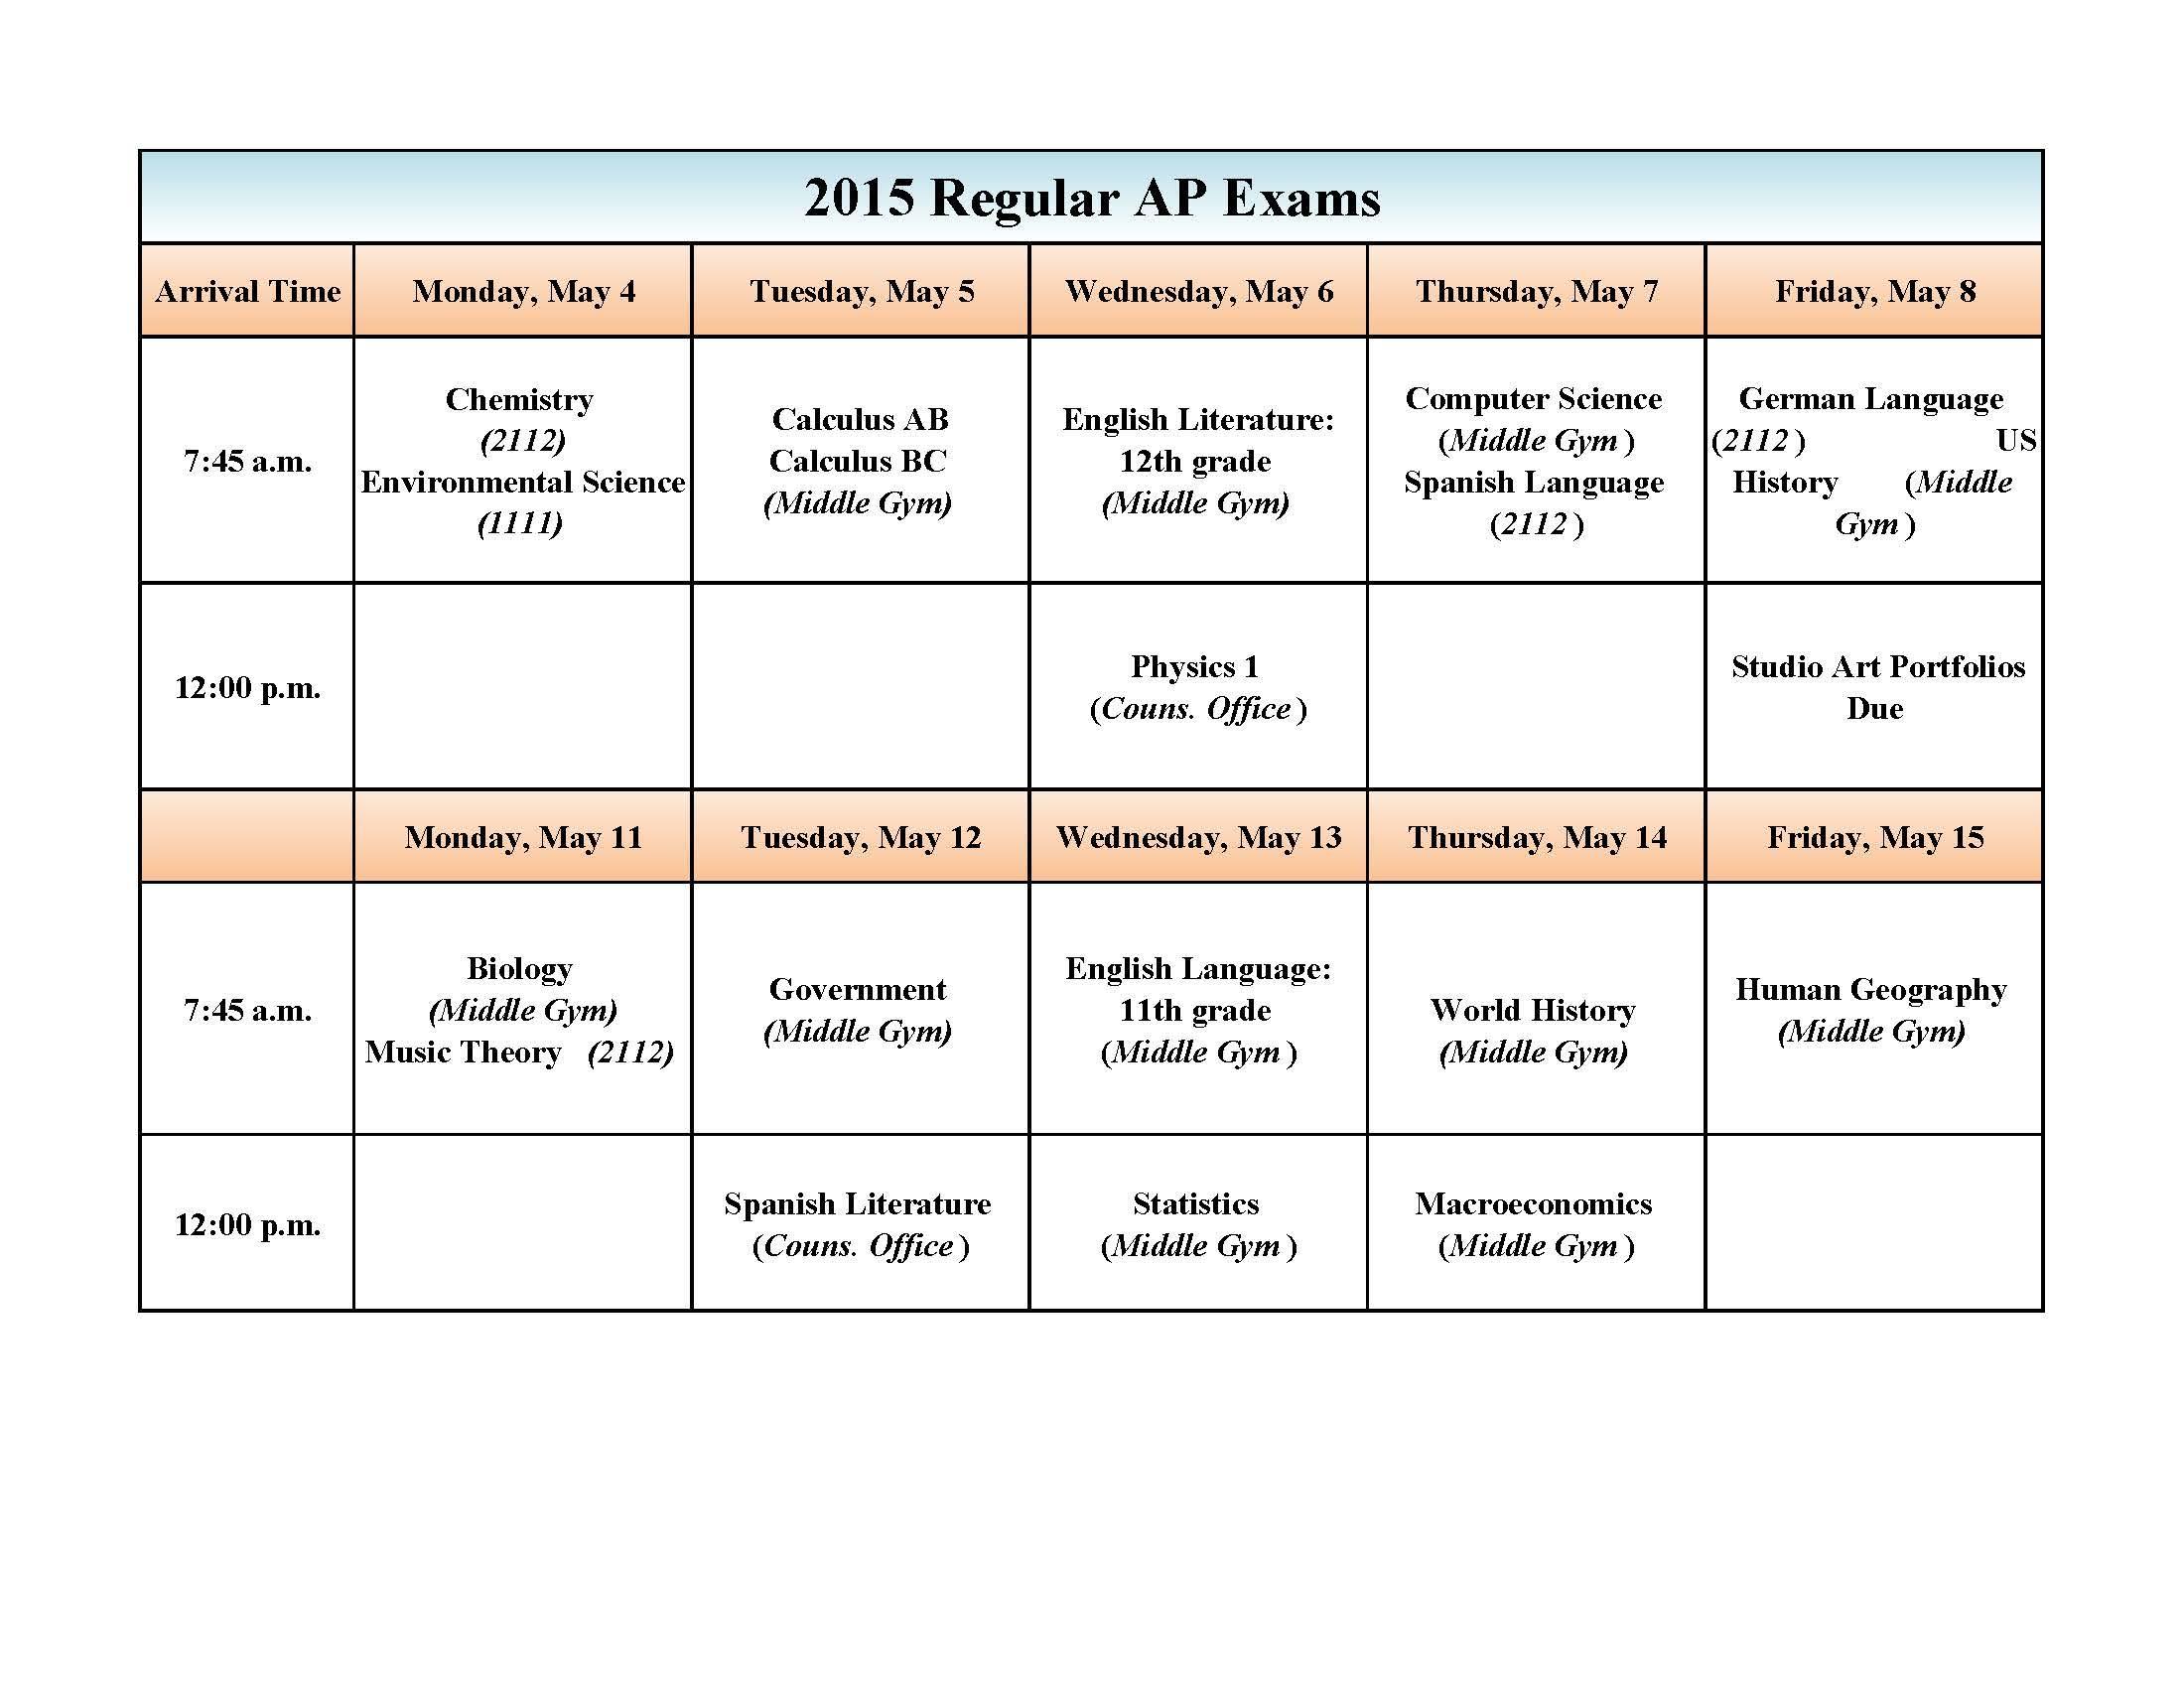 AP schedule